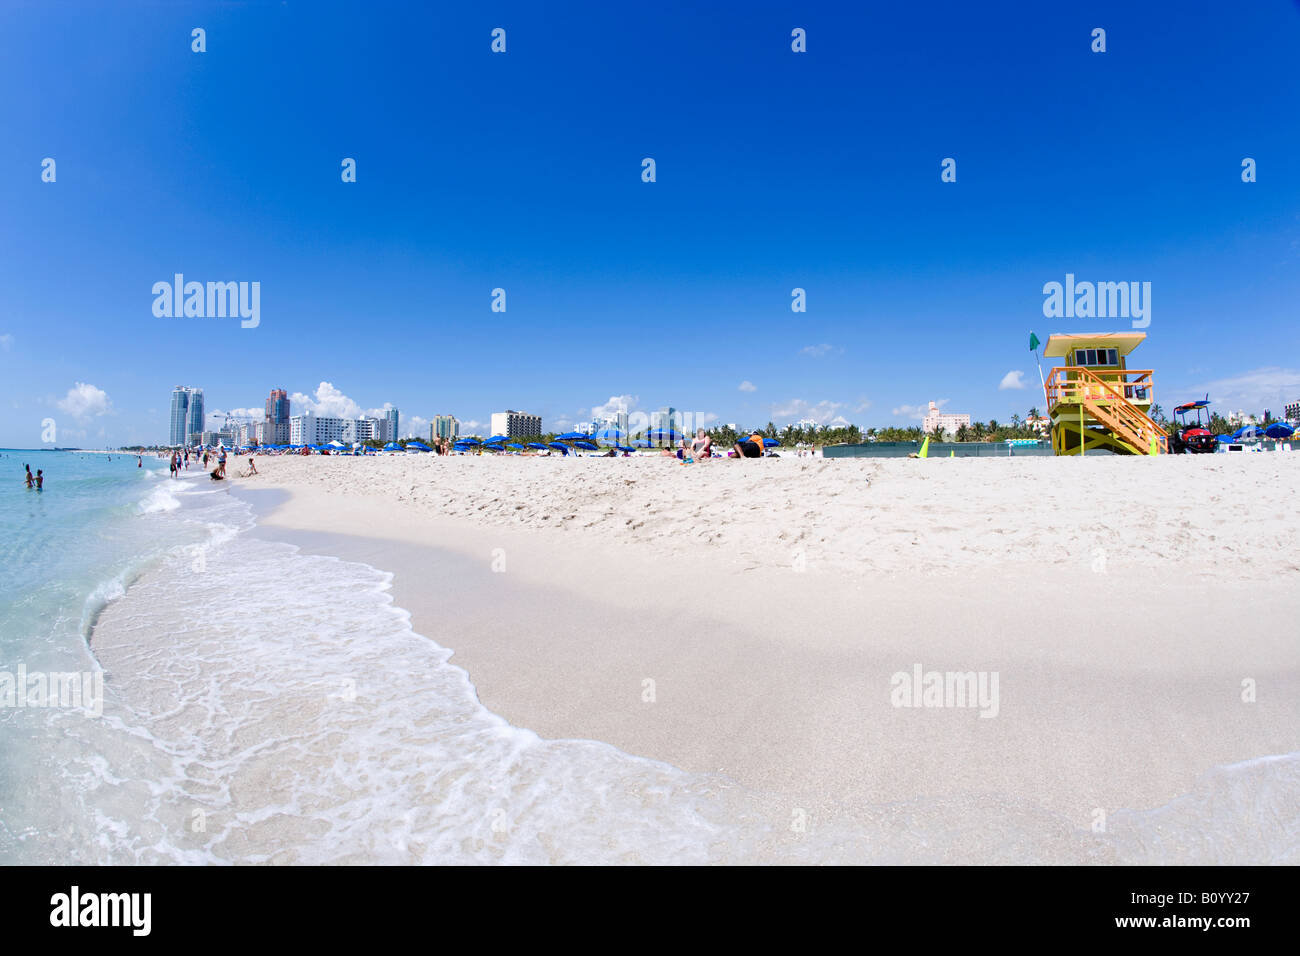 South Beach, Miami Beach, Florida, USA - Stock Image